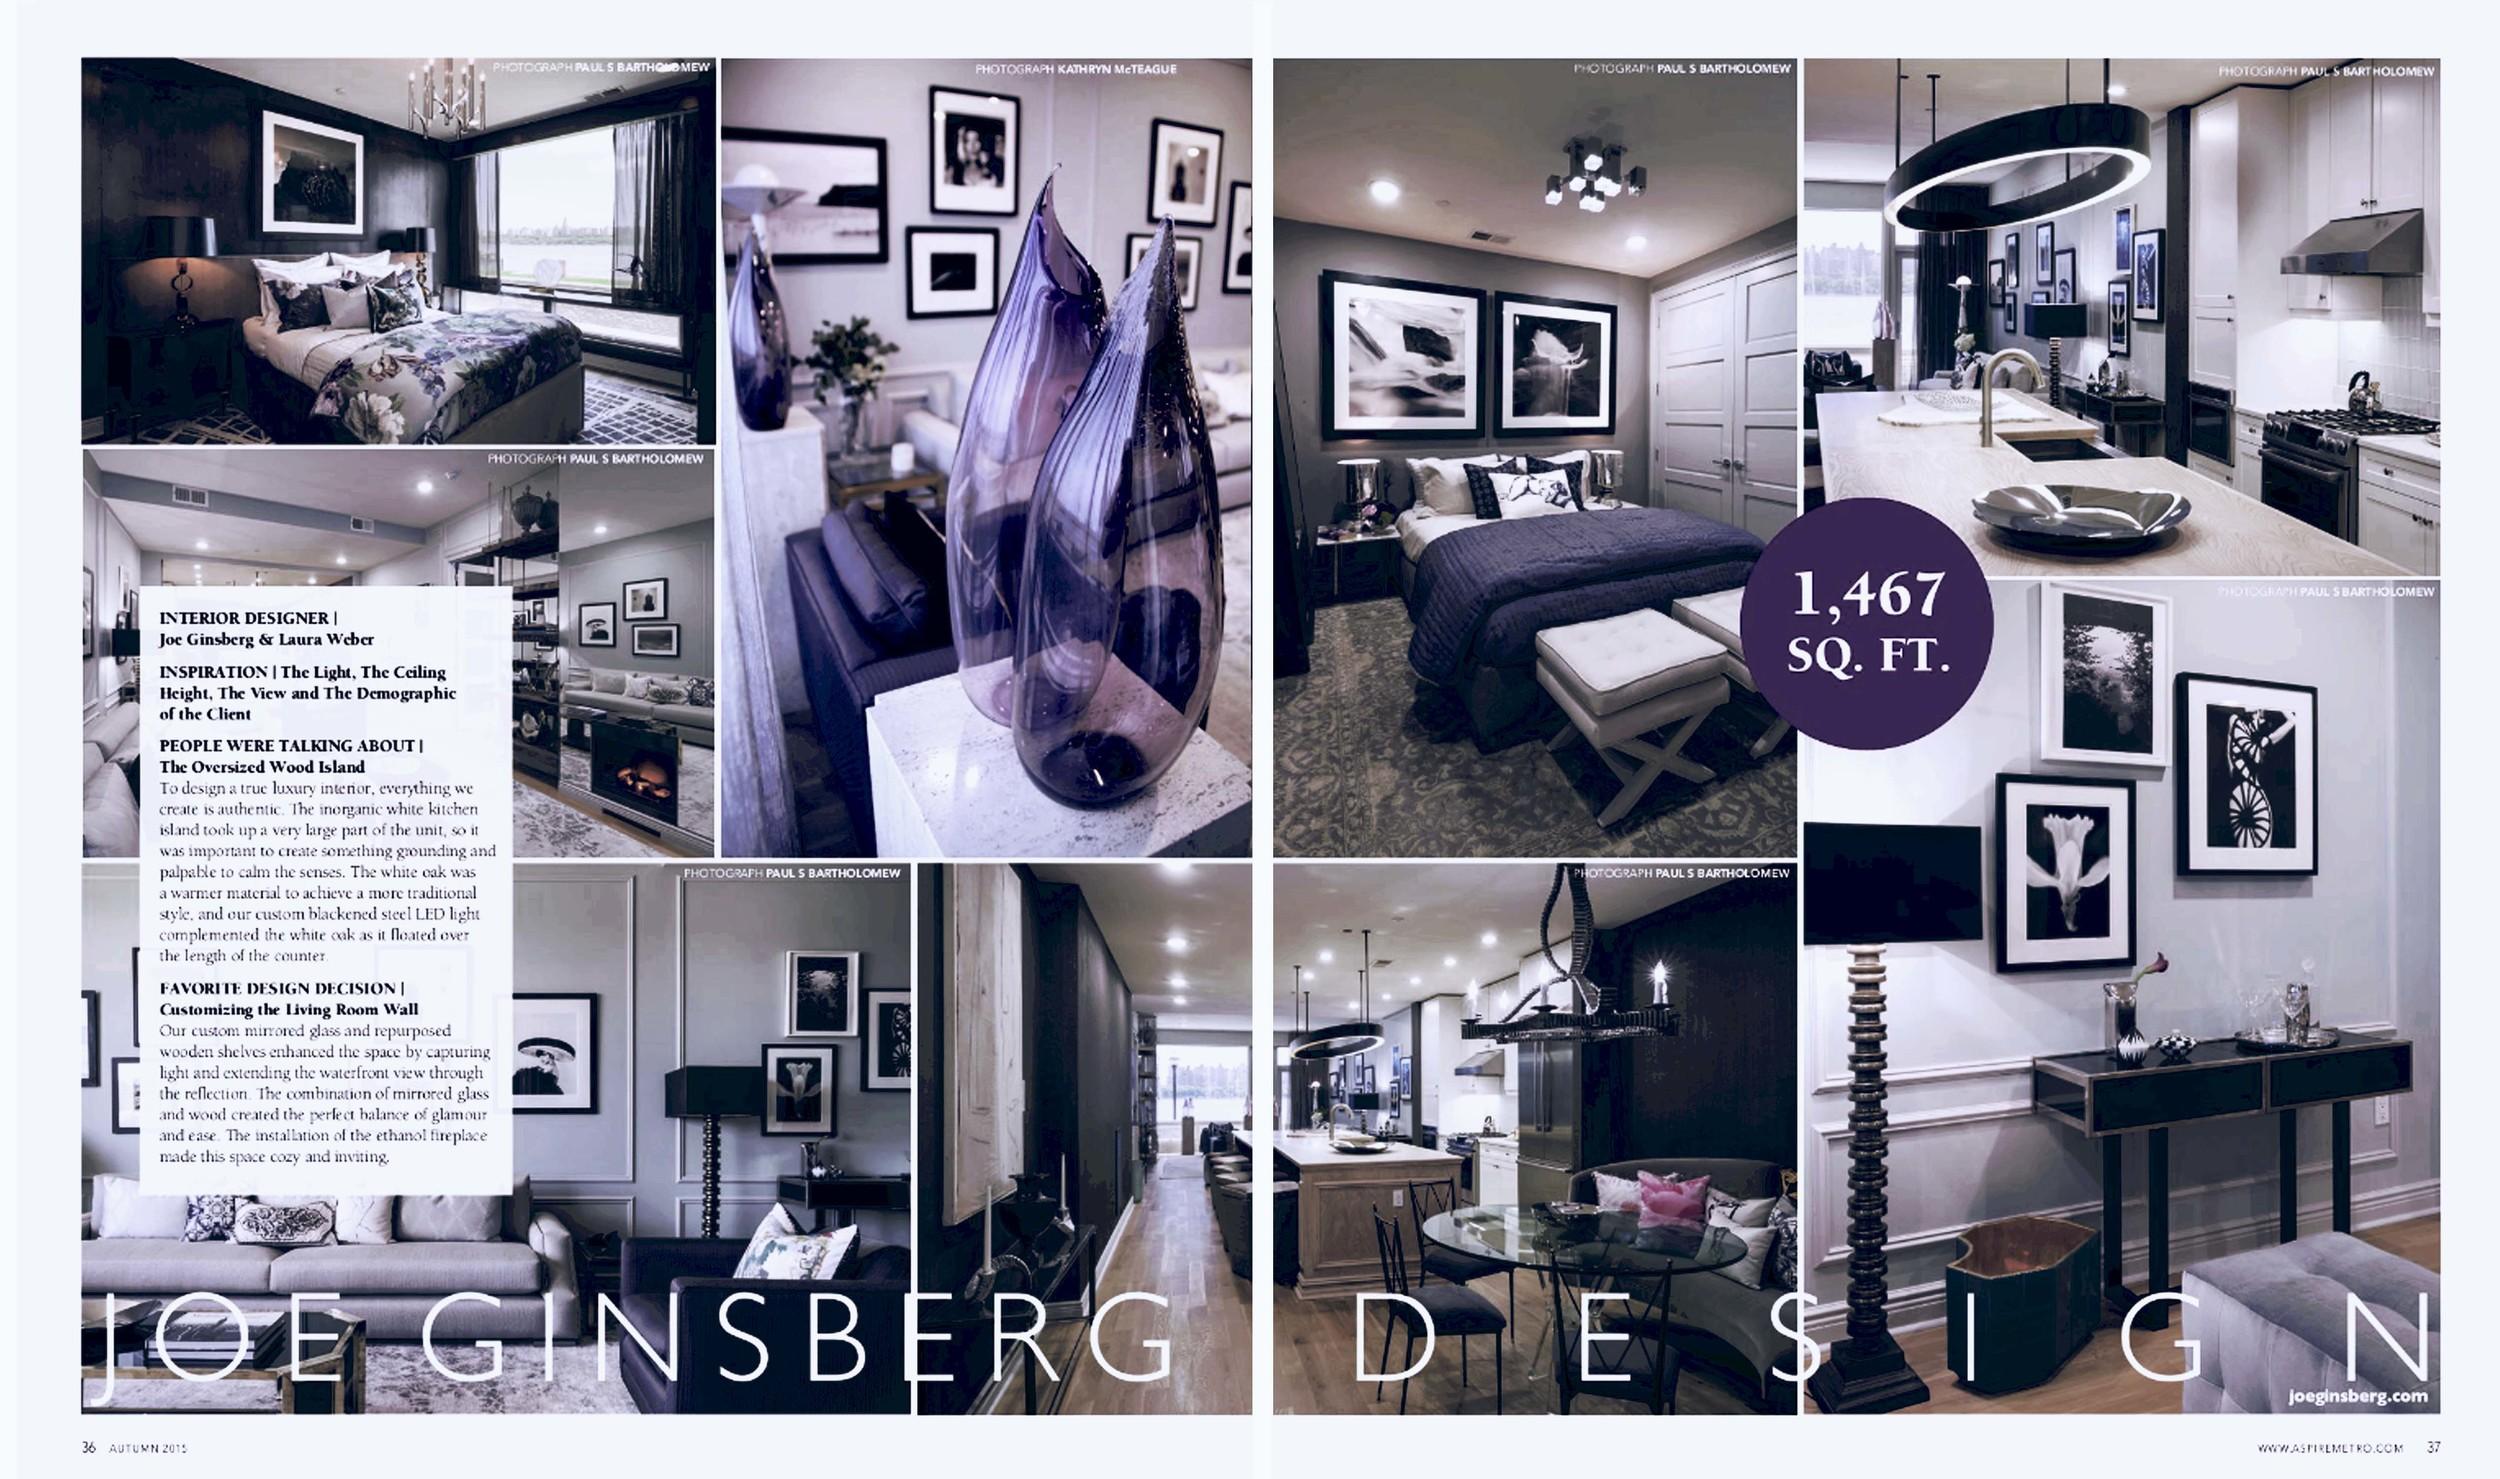 Design Studio in Manhattan, NY | Joe Ginsberg Design